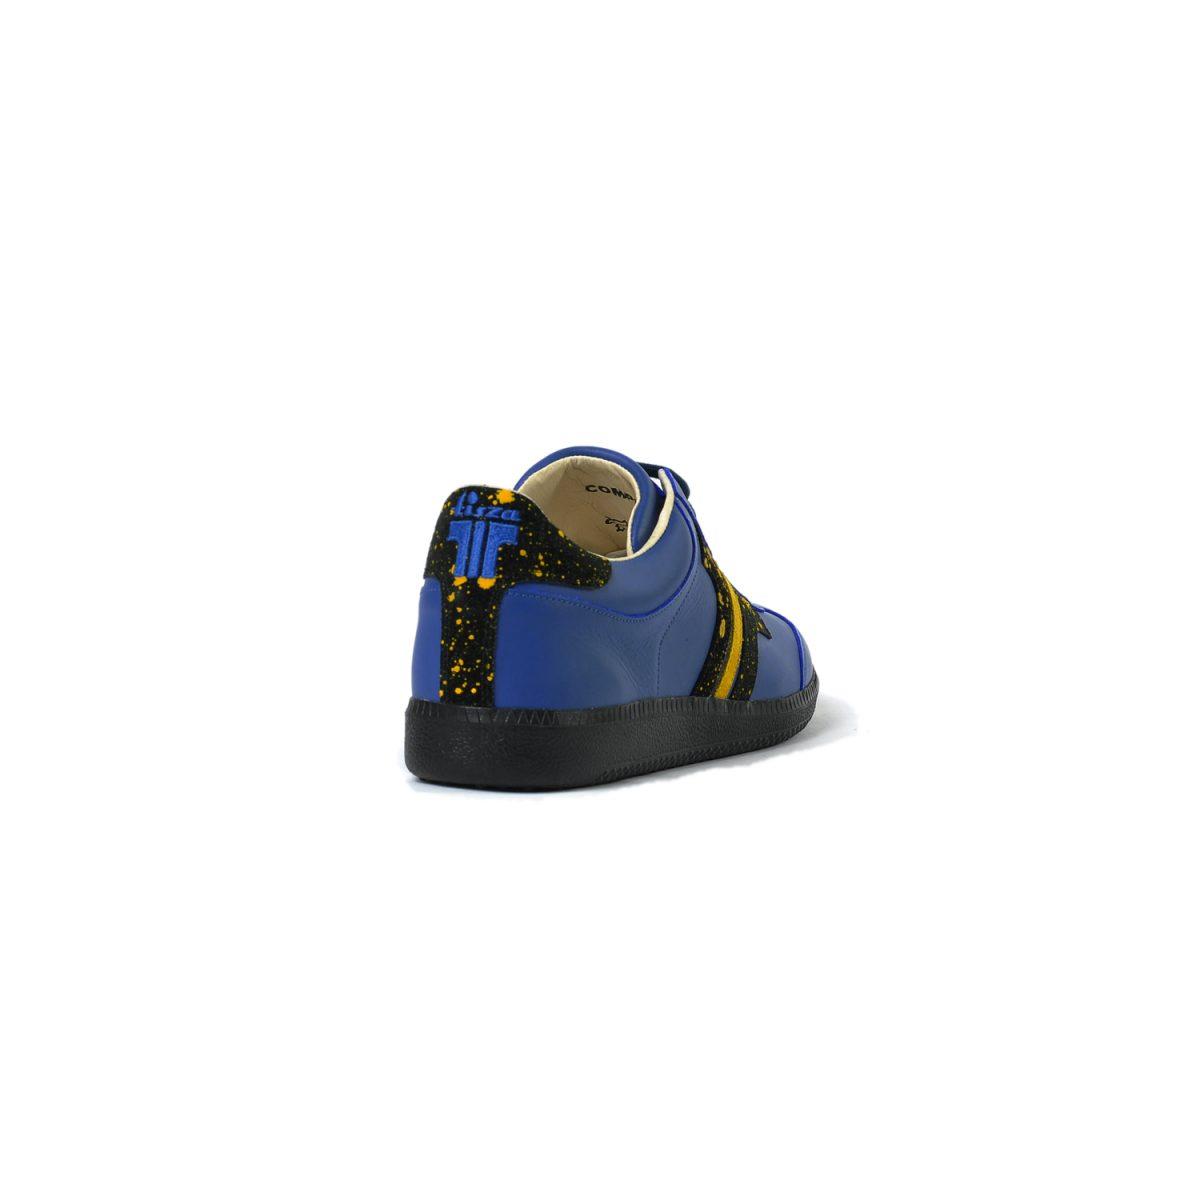 Tisza shoes - Compakt - Indigo-splash yellow